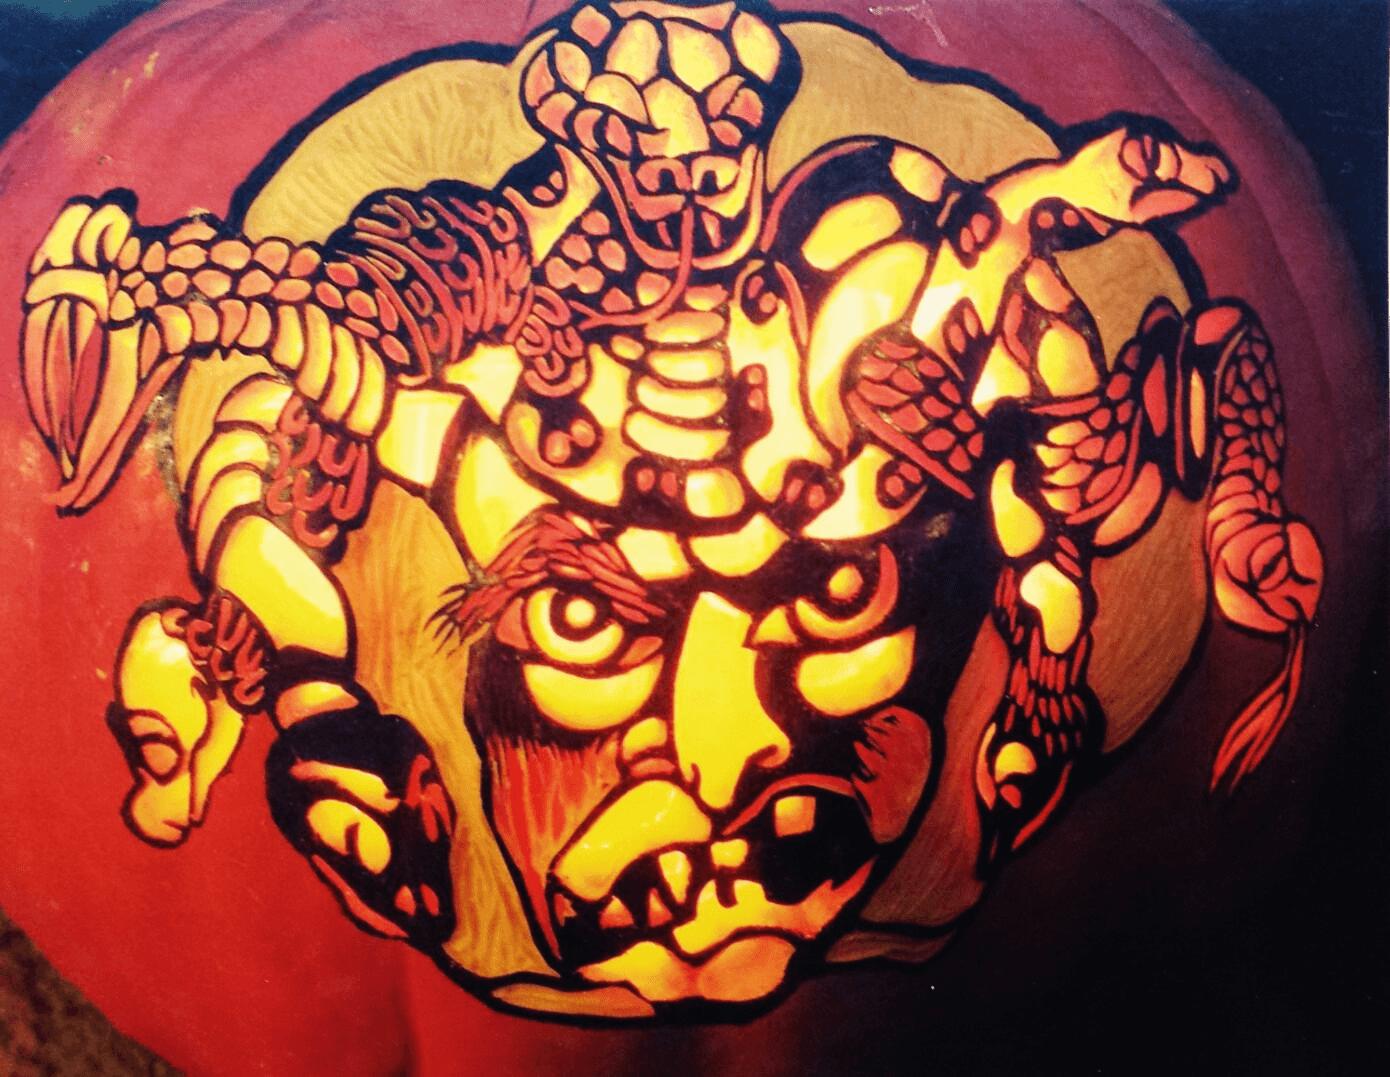 A Medusa pumpkin carving